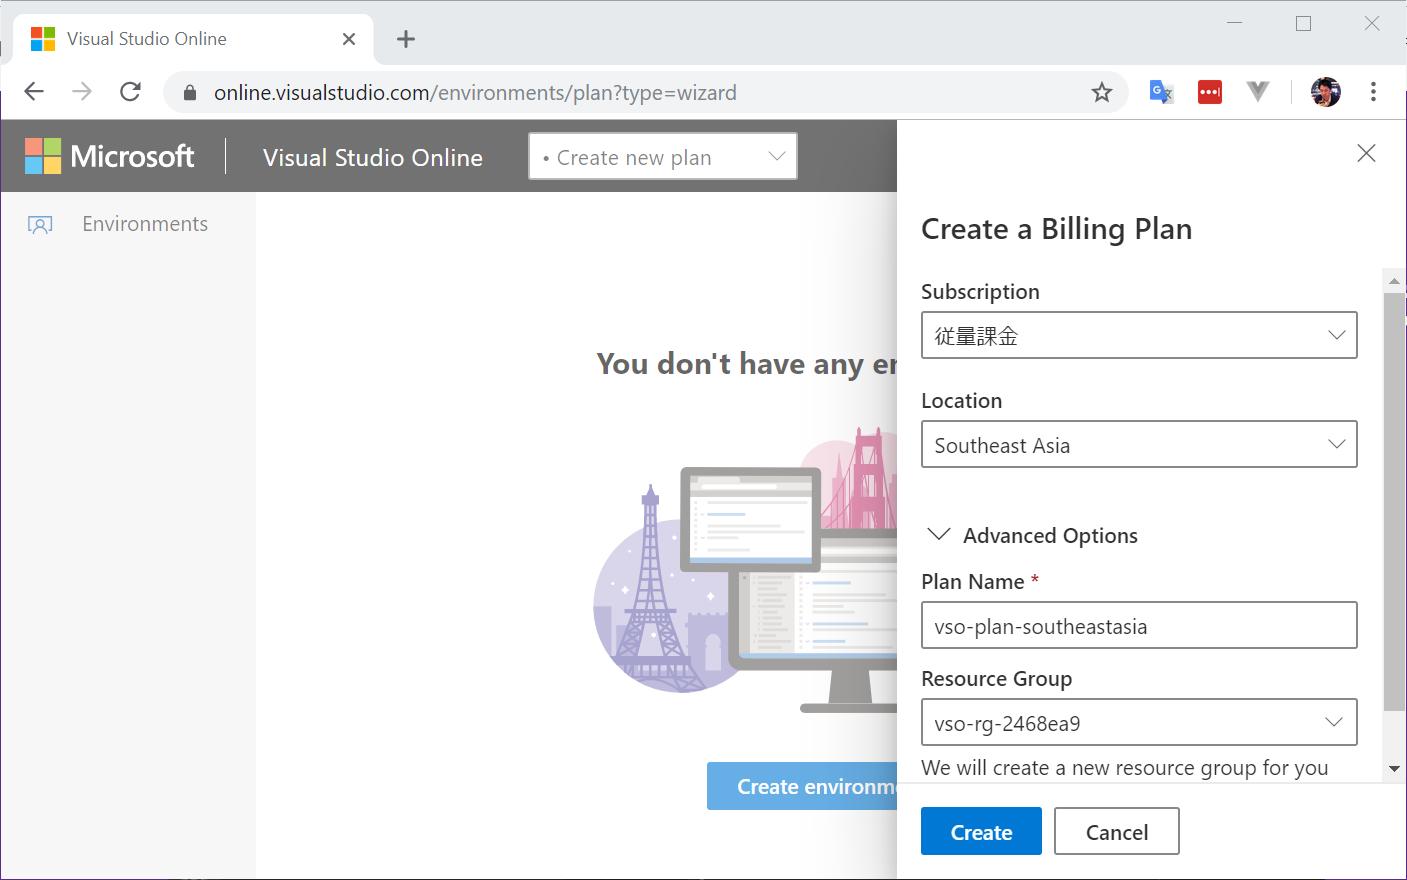 Visual Studio Online - Google Chrome 2019-11-05 10.02.28.png